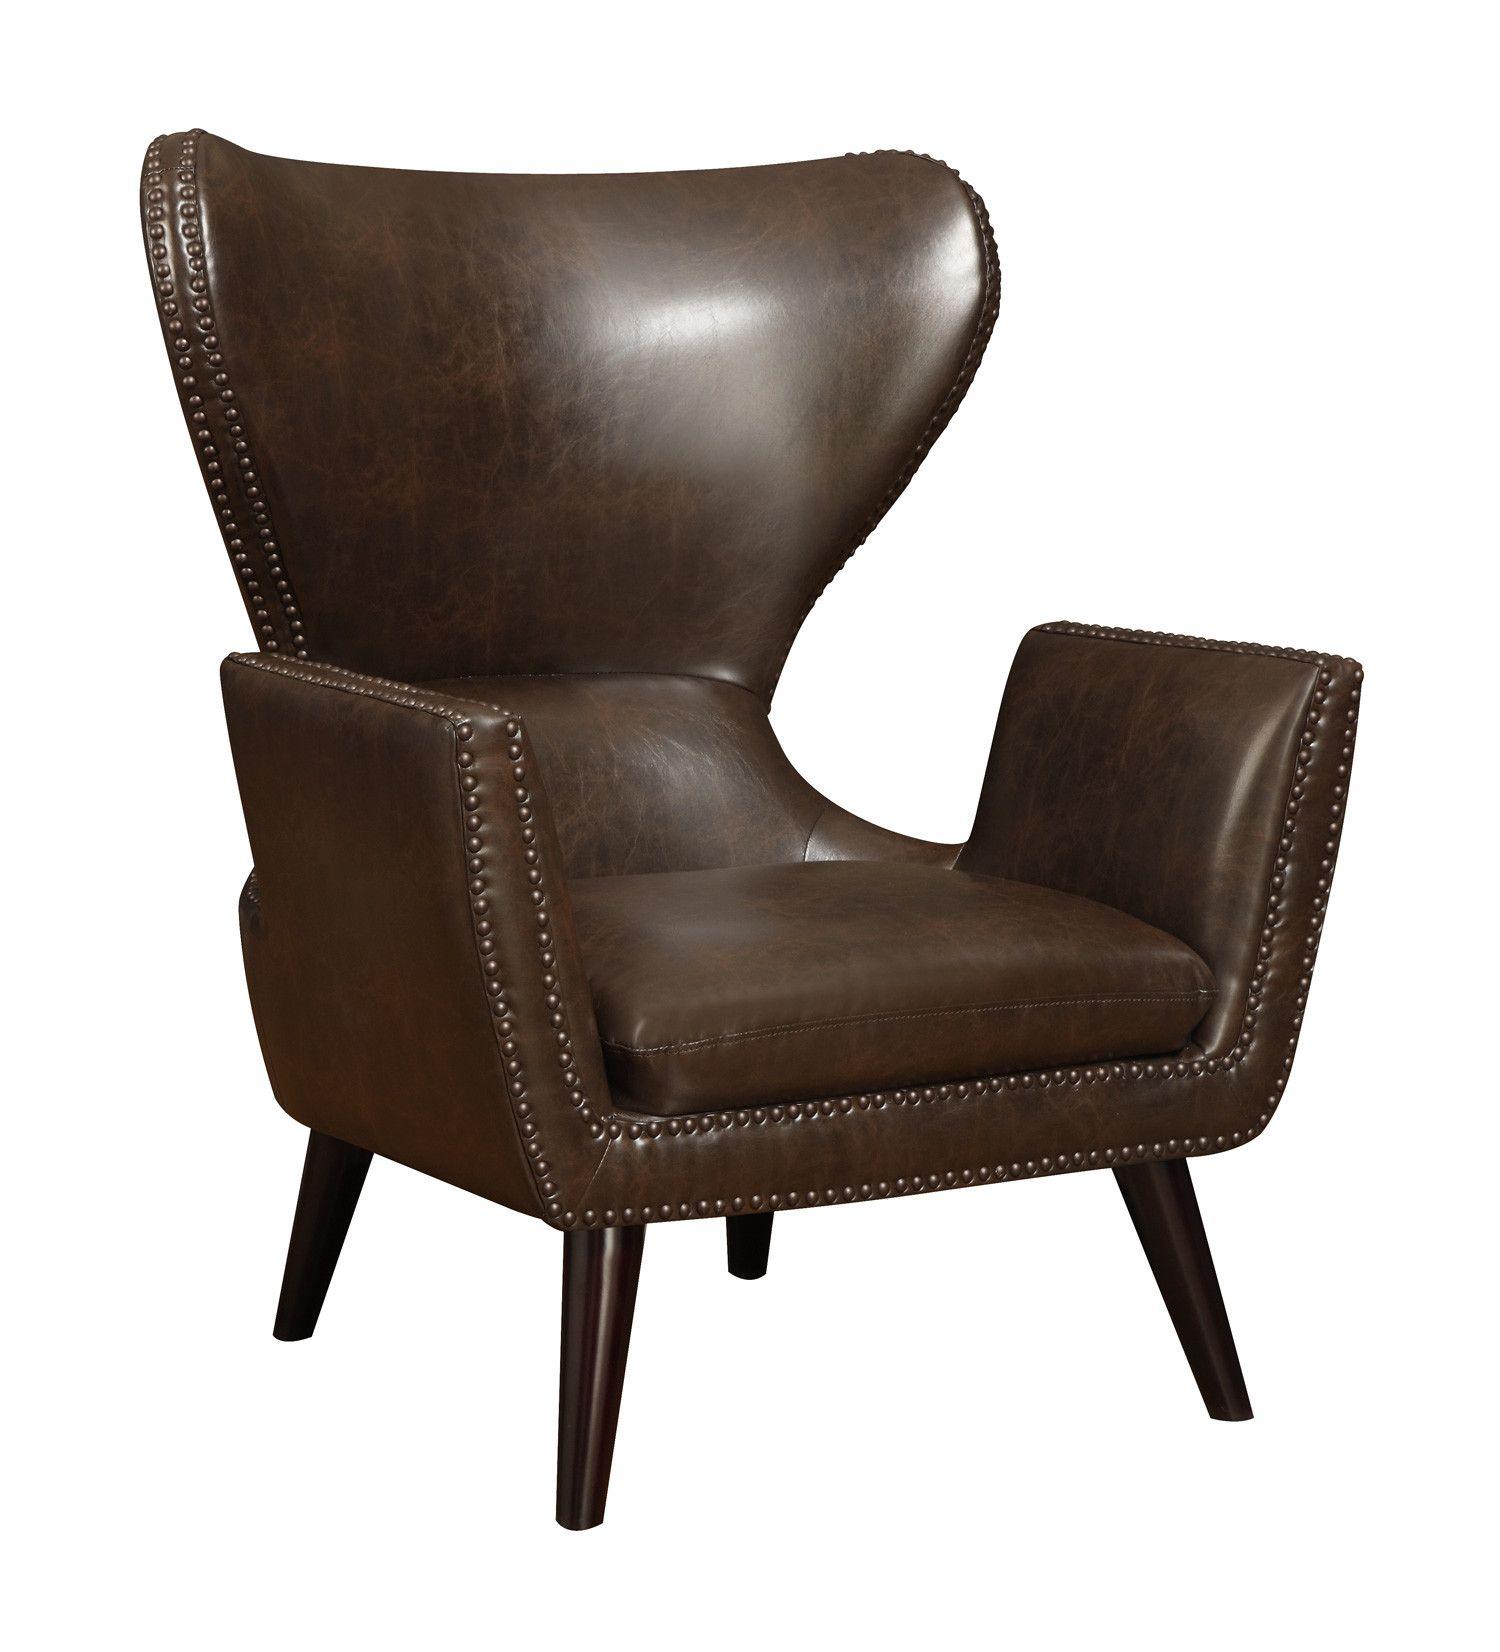 Wildon Home ® Arm Chair Wayfair Leather wingback chair